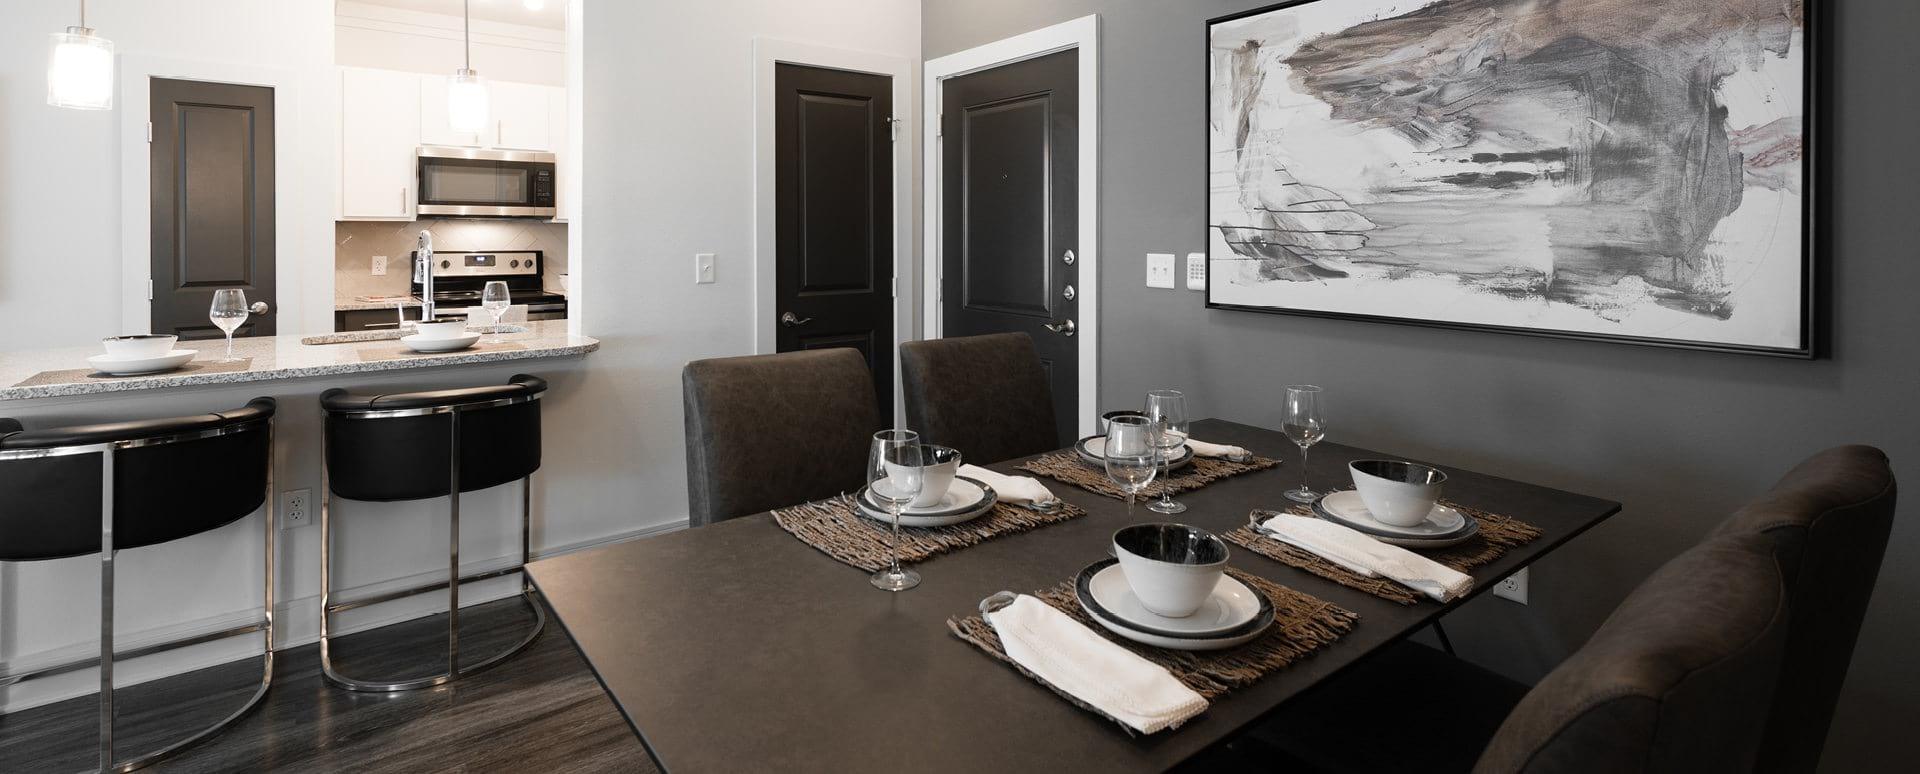 Luxury apartment floor plan at Cortland Presidio West